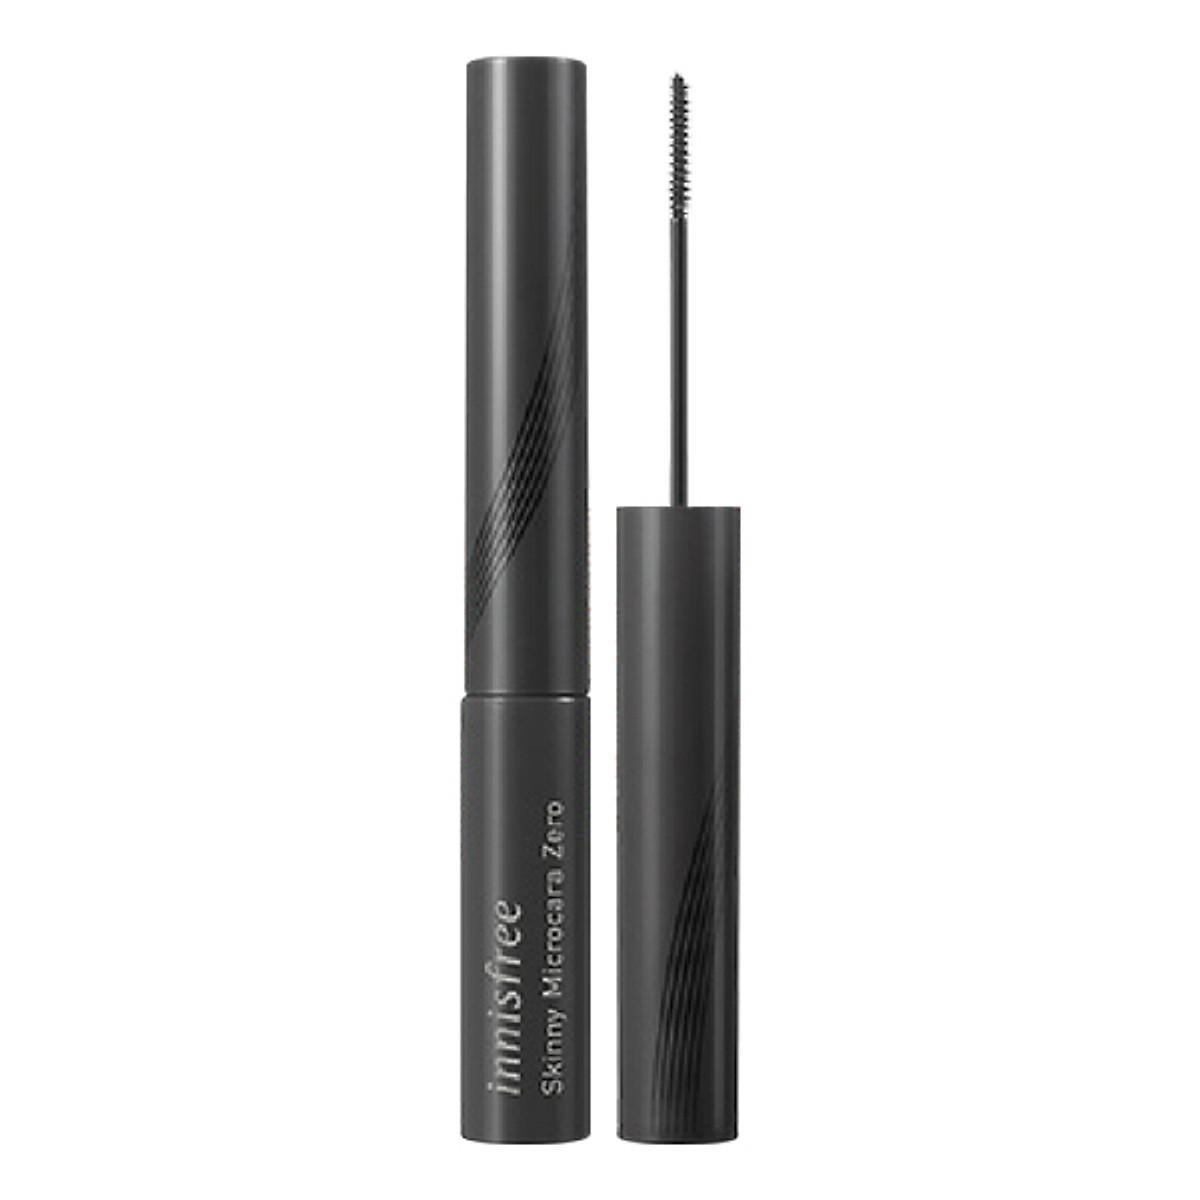 Đánh giá Mascara Chải Mi Siêu Mảnh Chống Trôi Innisfree Skinny Microcara Zero